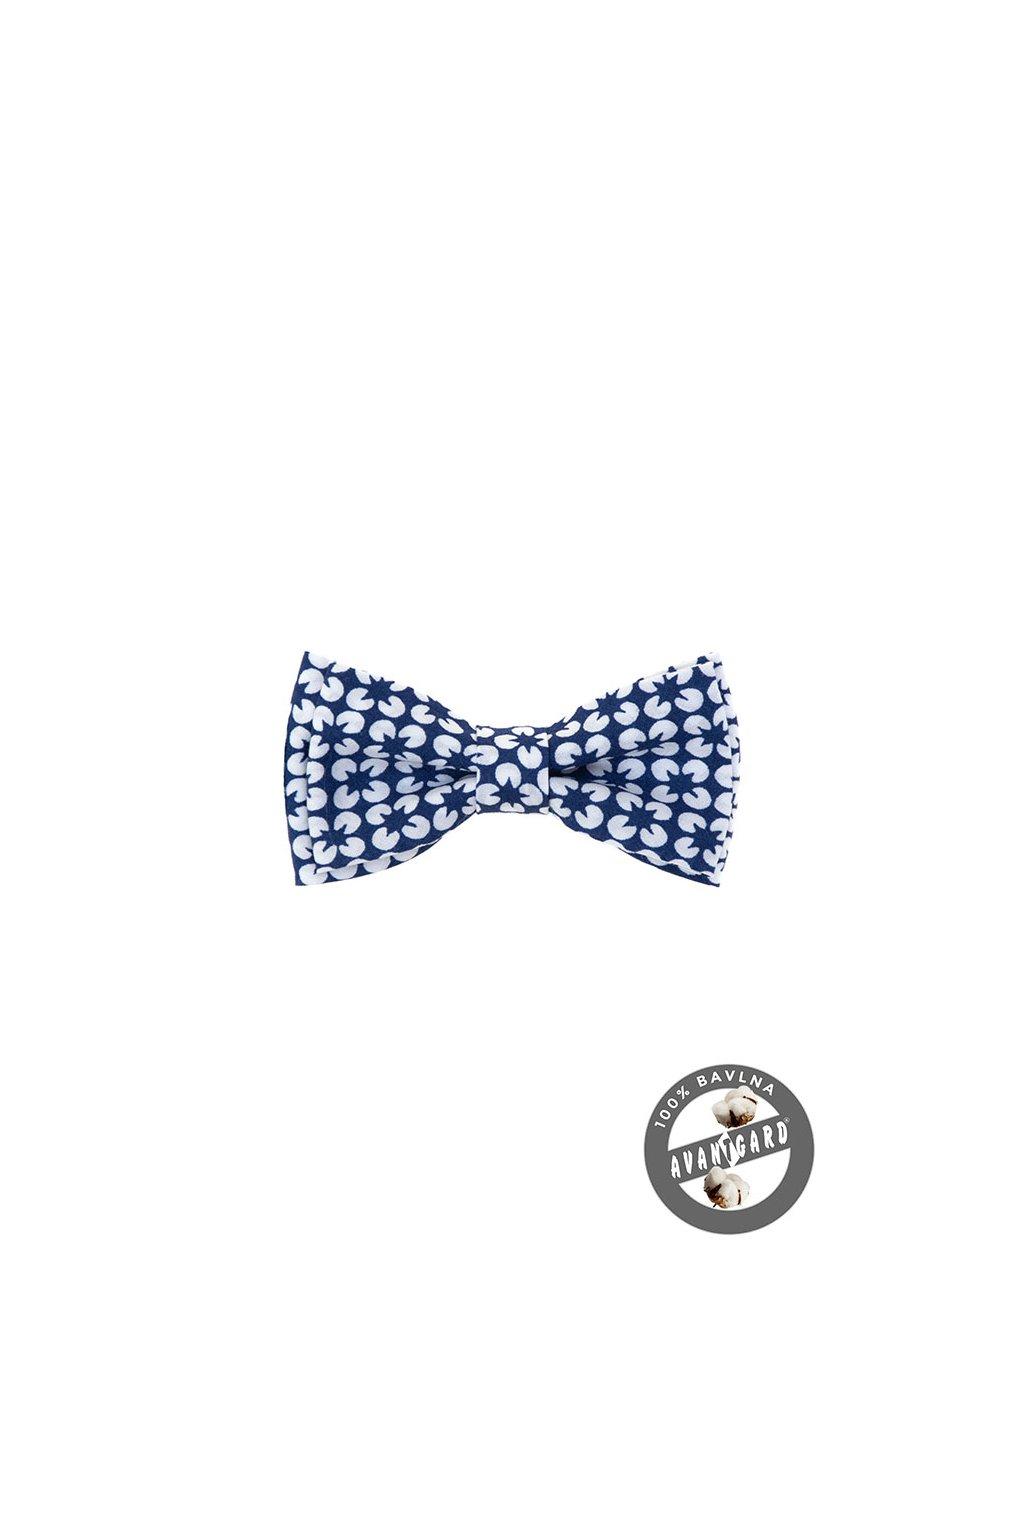 Motýlek MINI modro-bílá 531 - 5068